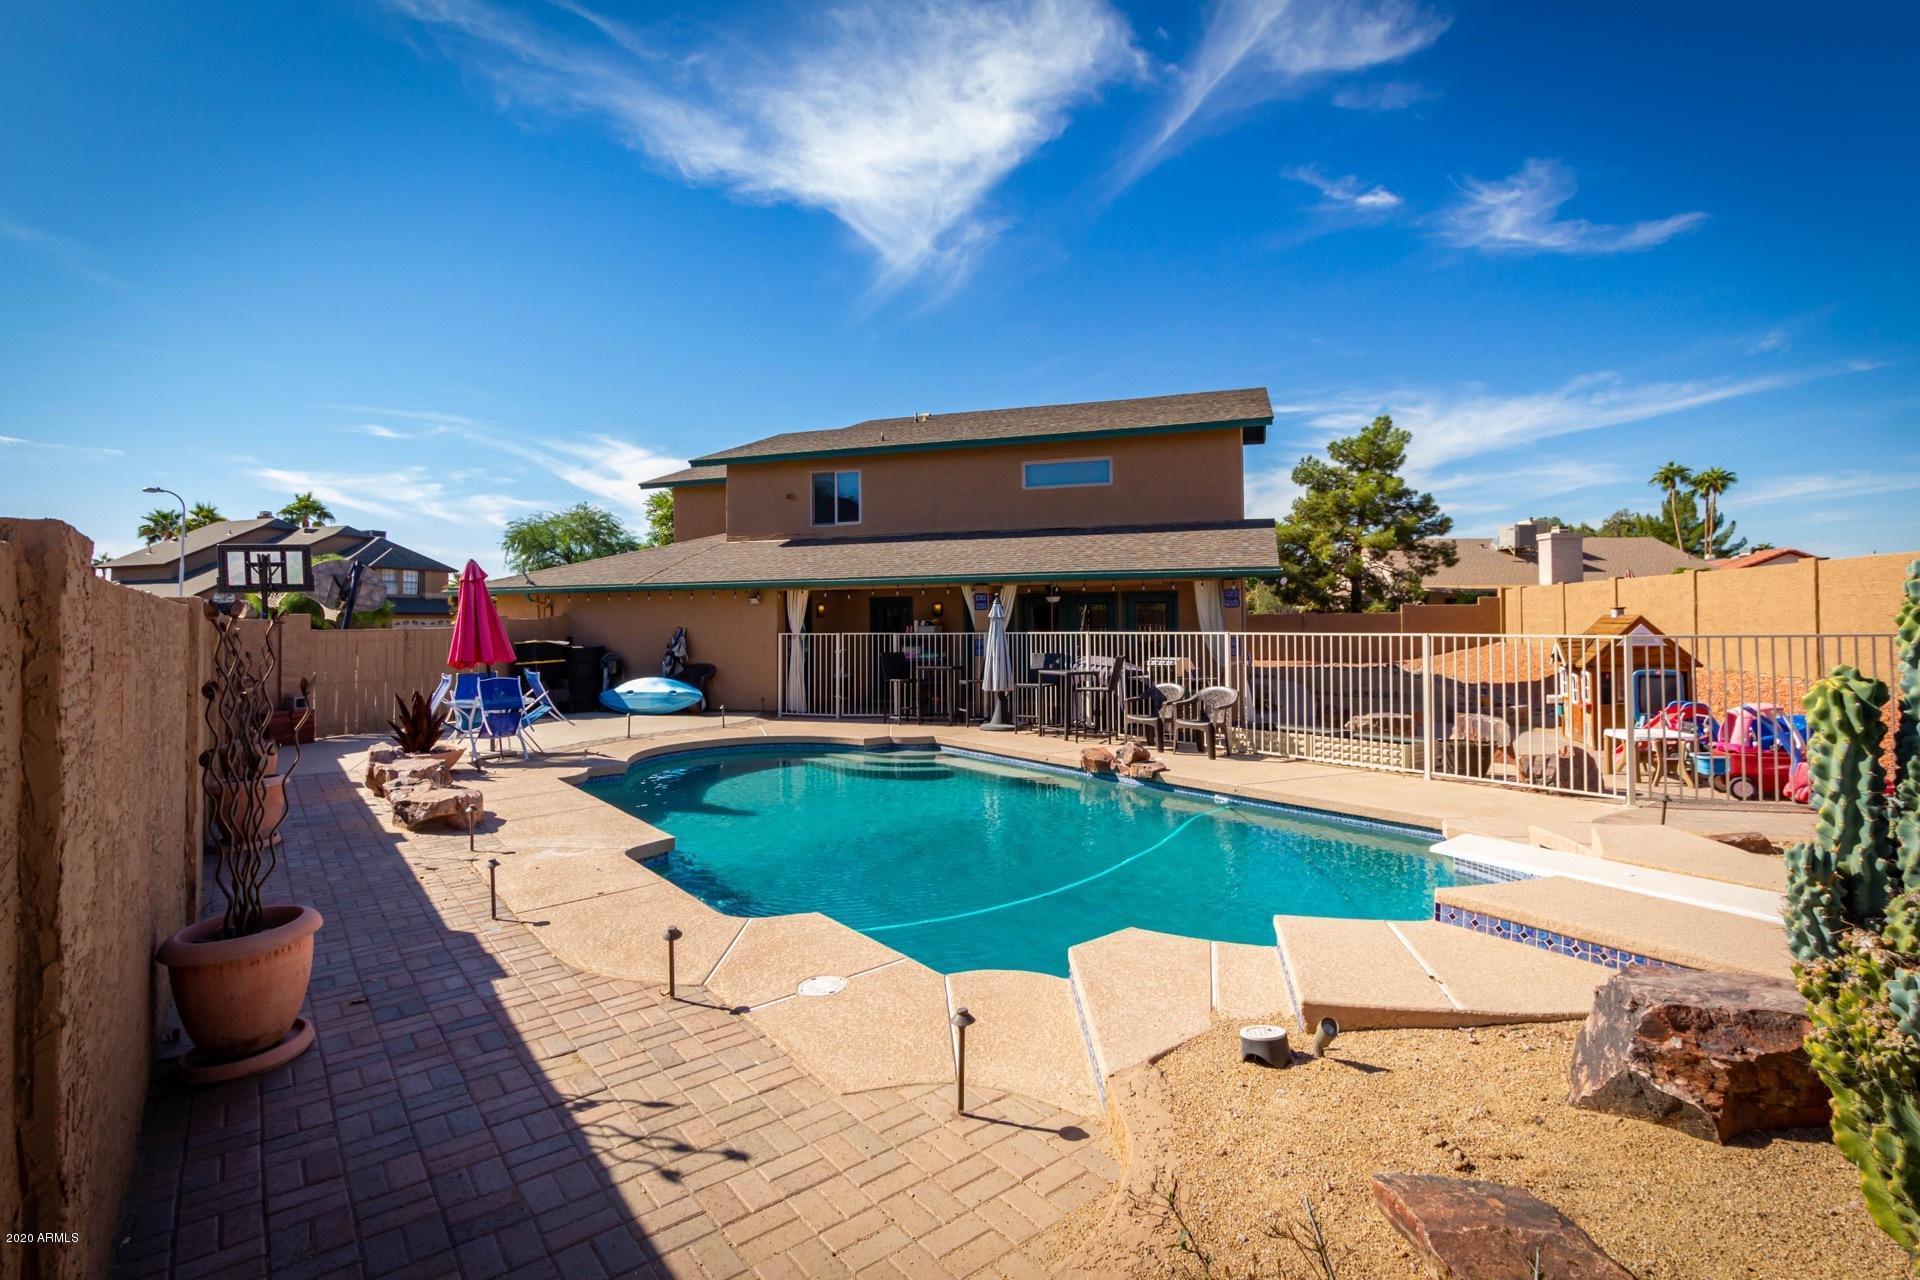 MLS 6157390 7714 W PERSHING Avenue, Peoria, AZ 85381 Peoria AZ Central Peoria